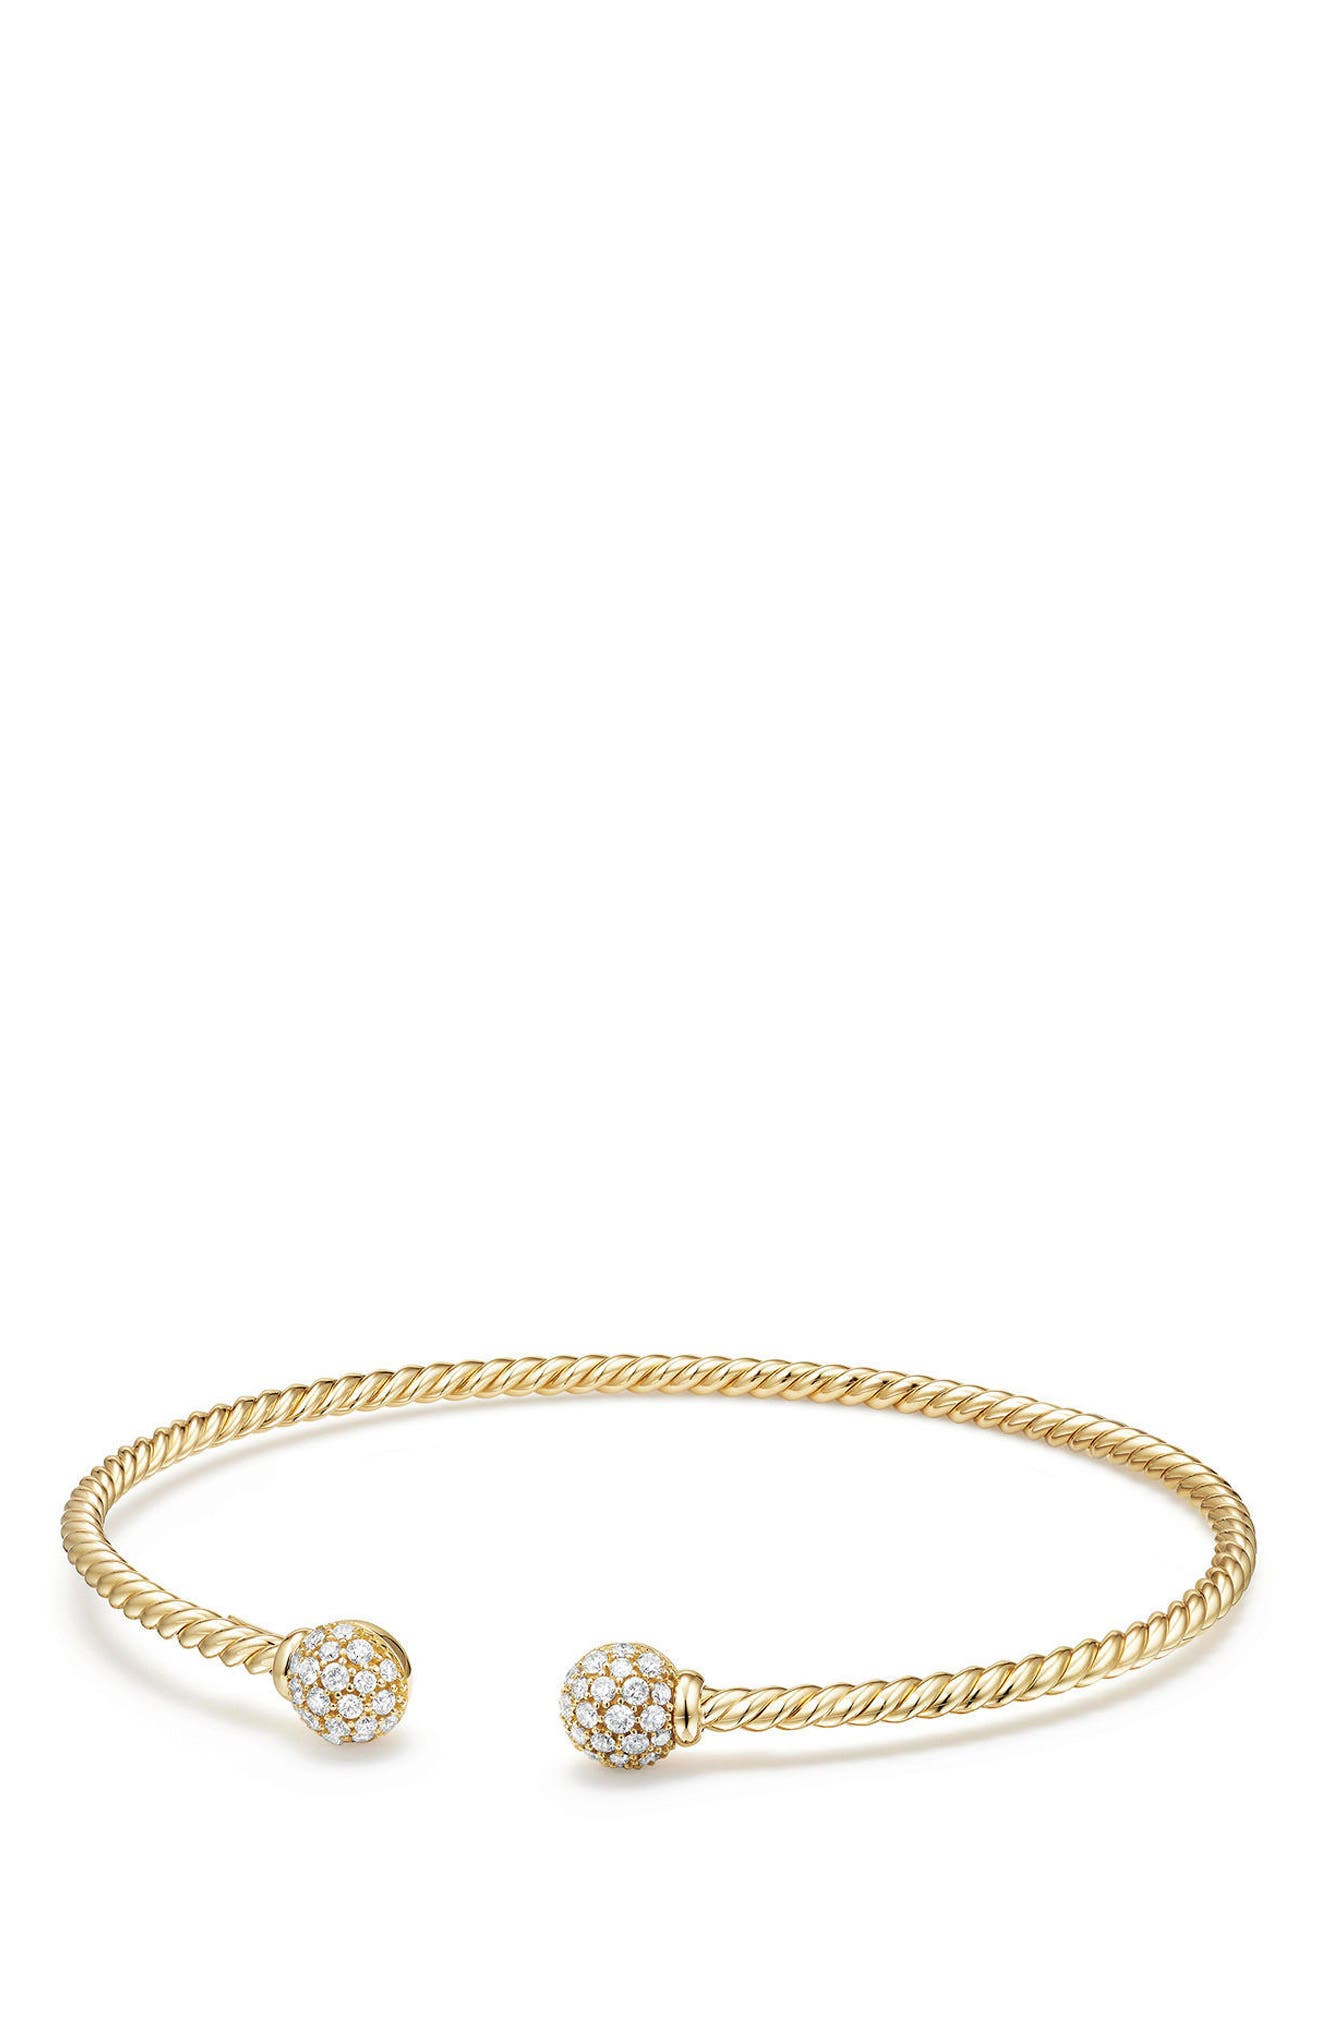 Solari Bead Bracelet with Diamonds in 18K Gold,                             Main thumbnail 1, color,                             Yellow Gold/ Diamond